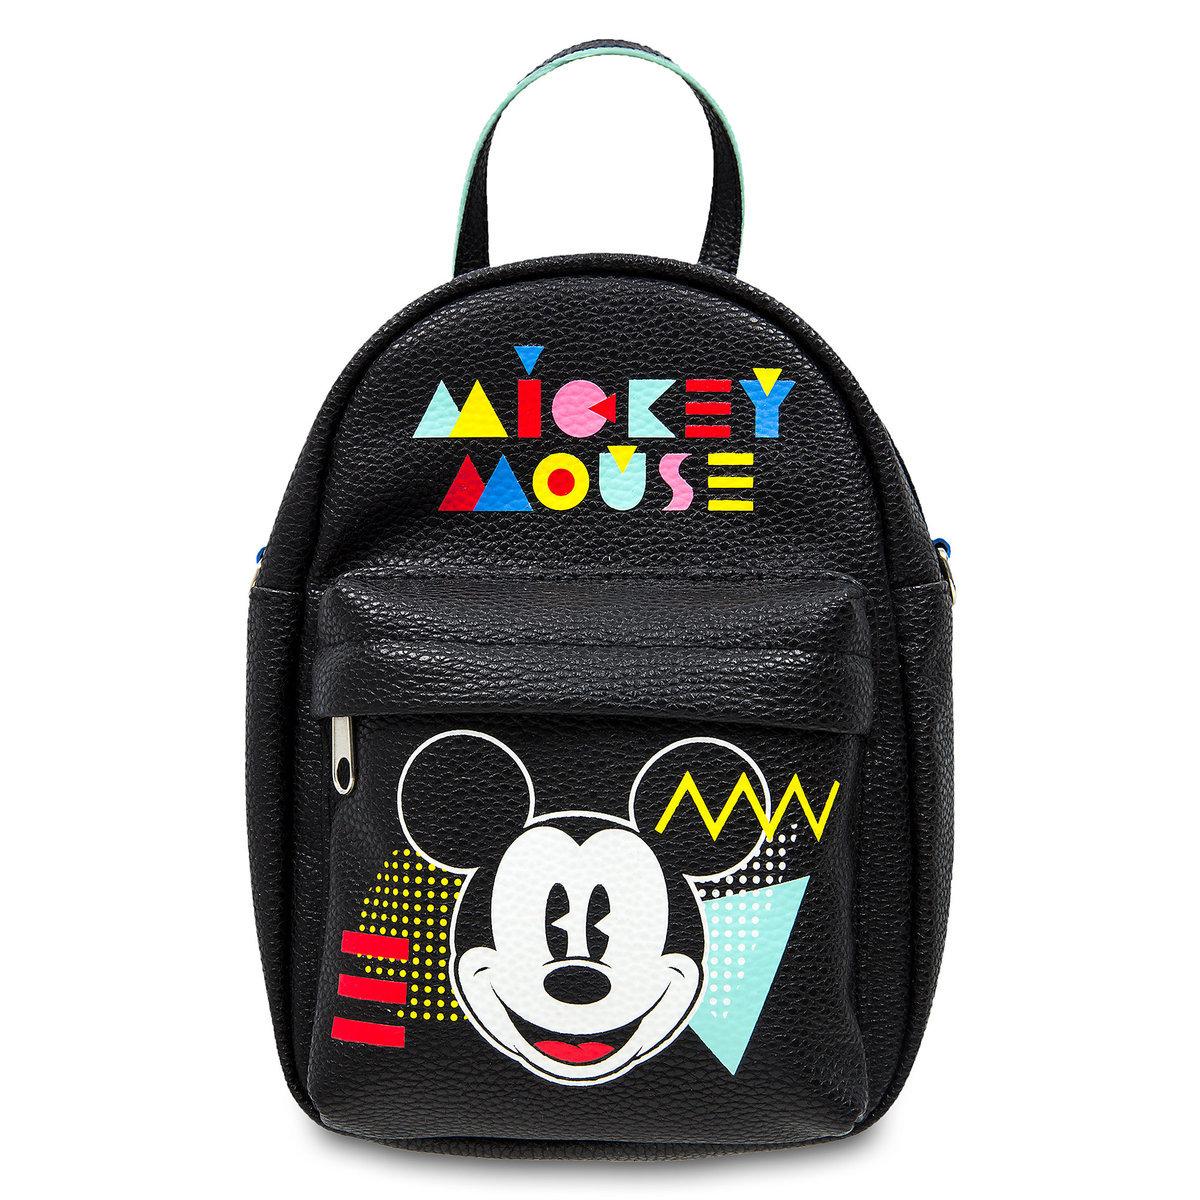 ebbdb56e6be Disney Backpack Bag - Flashback Mickey Neon